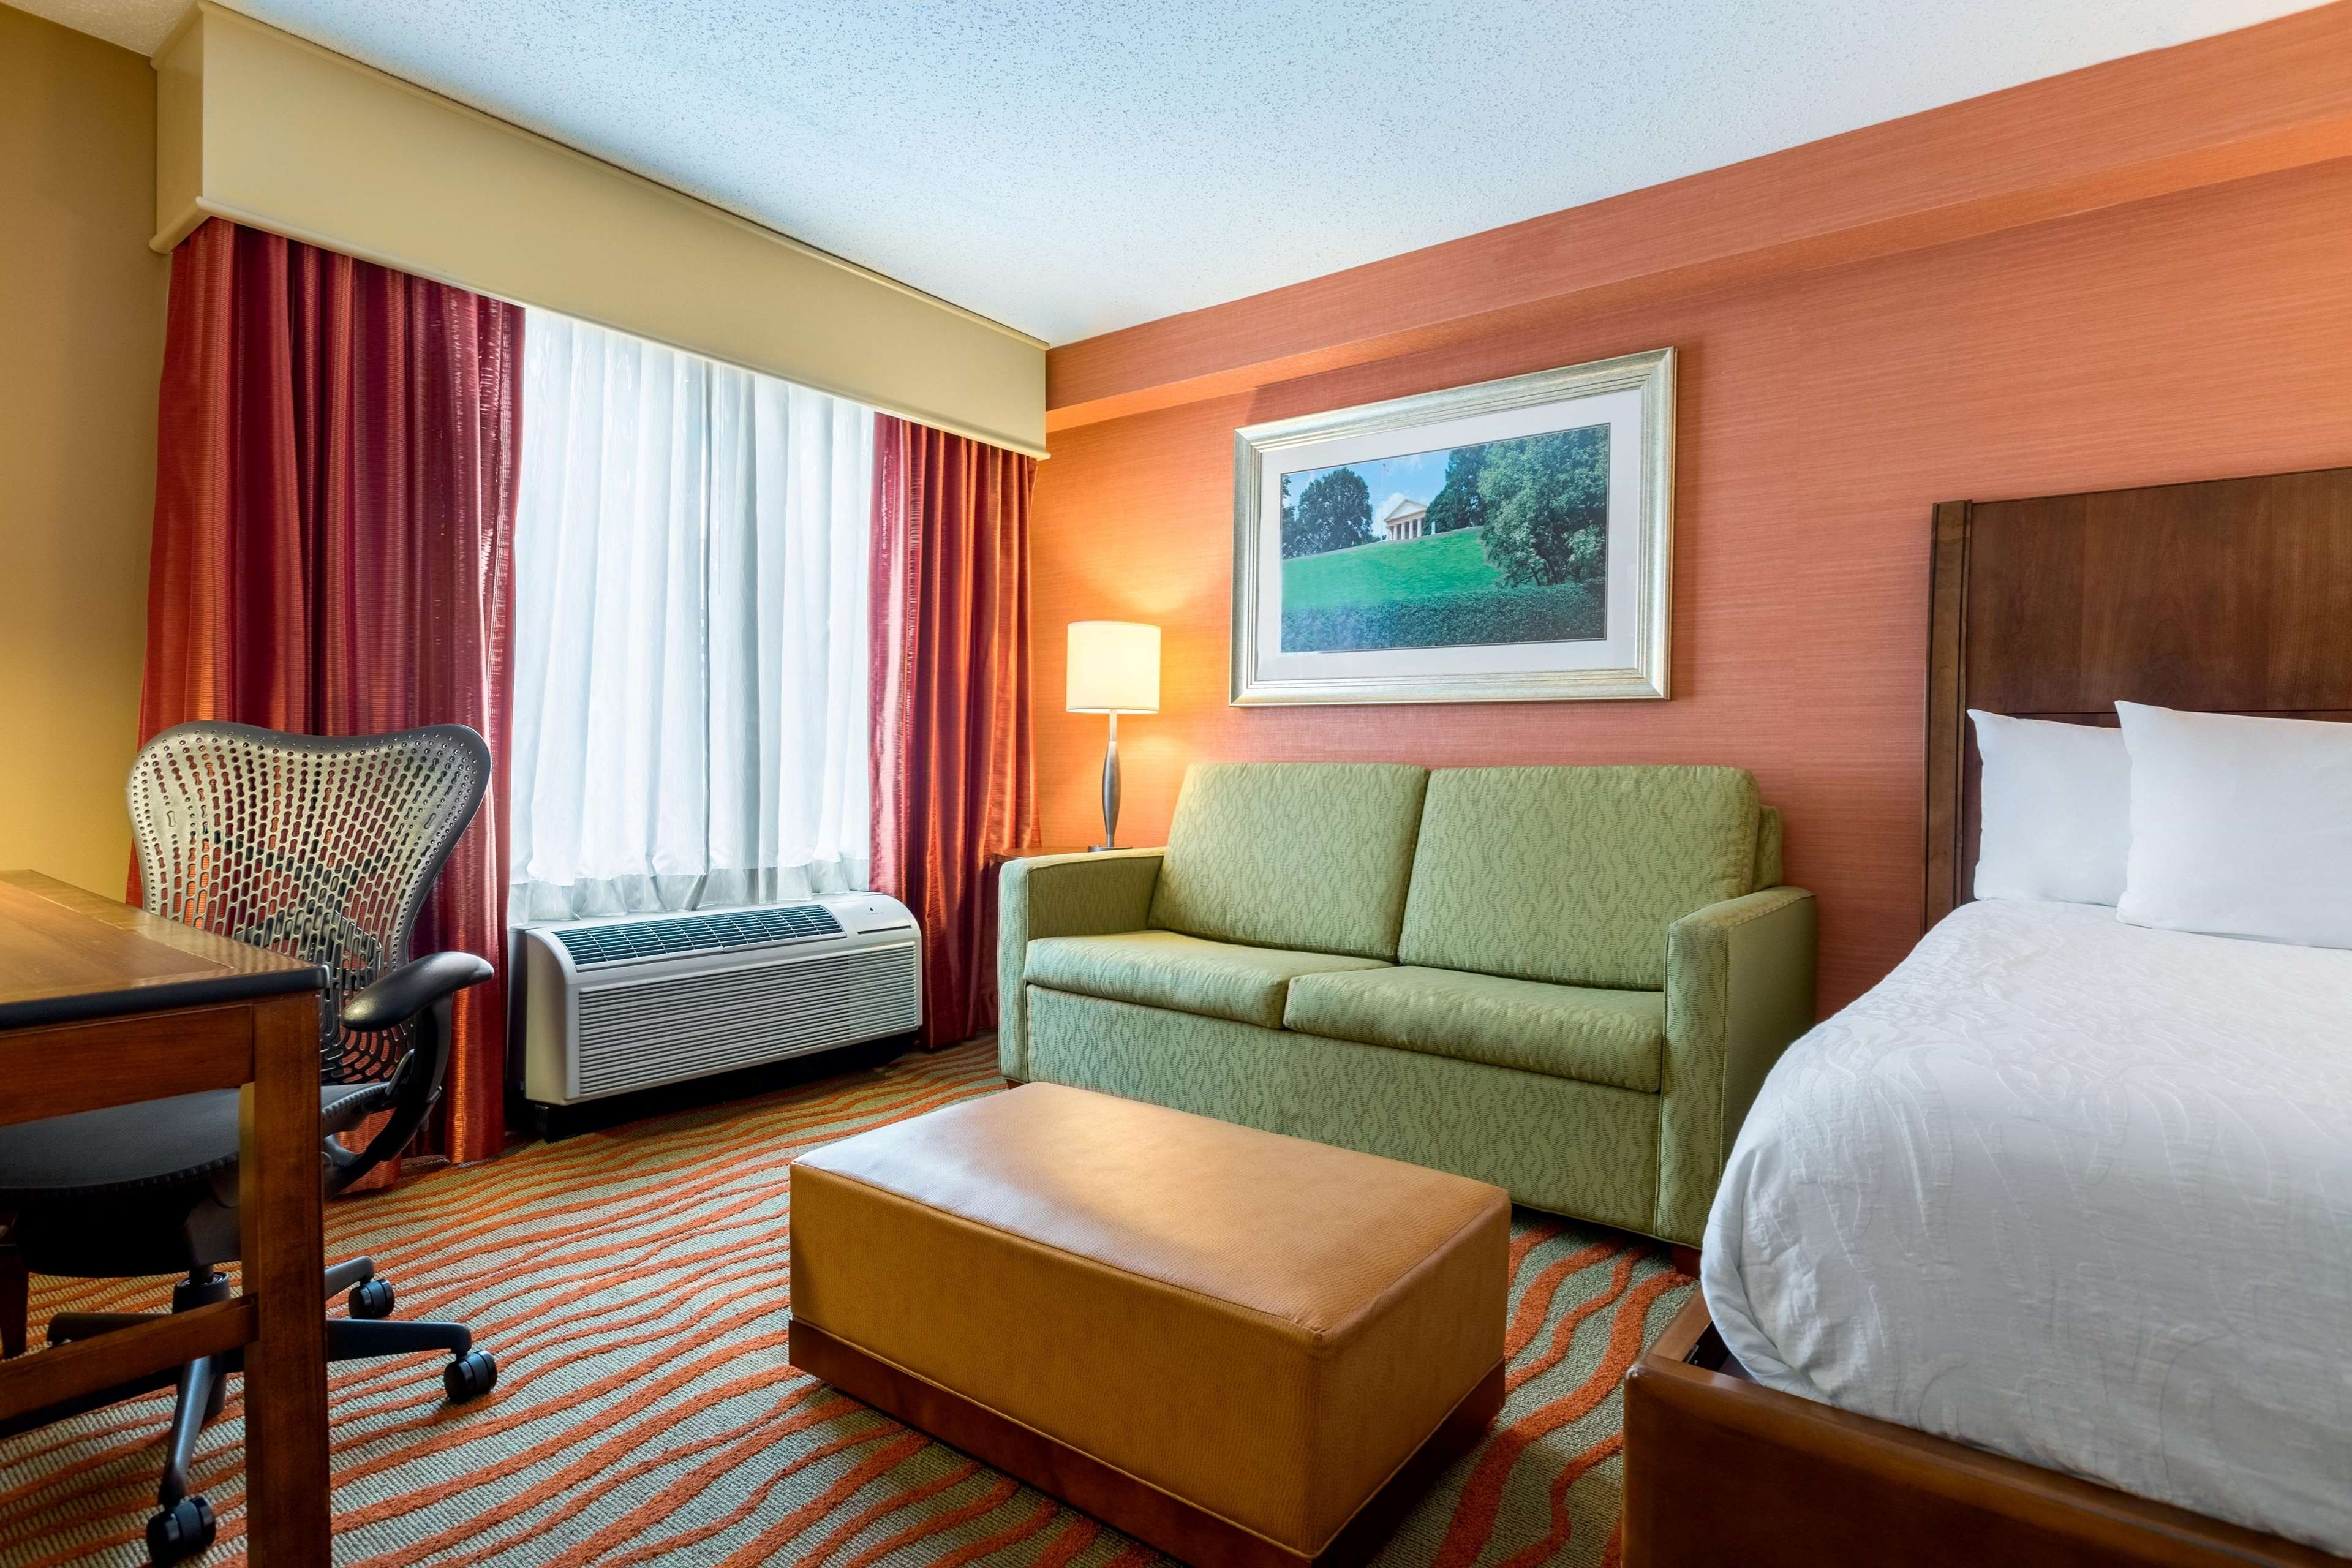 Hilton Garden Inn Arlington/Courthouse Plaza image 19